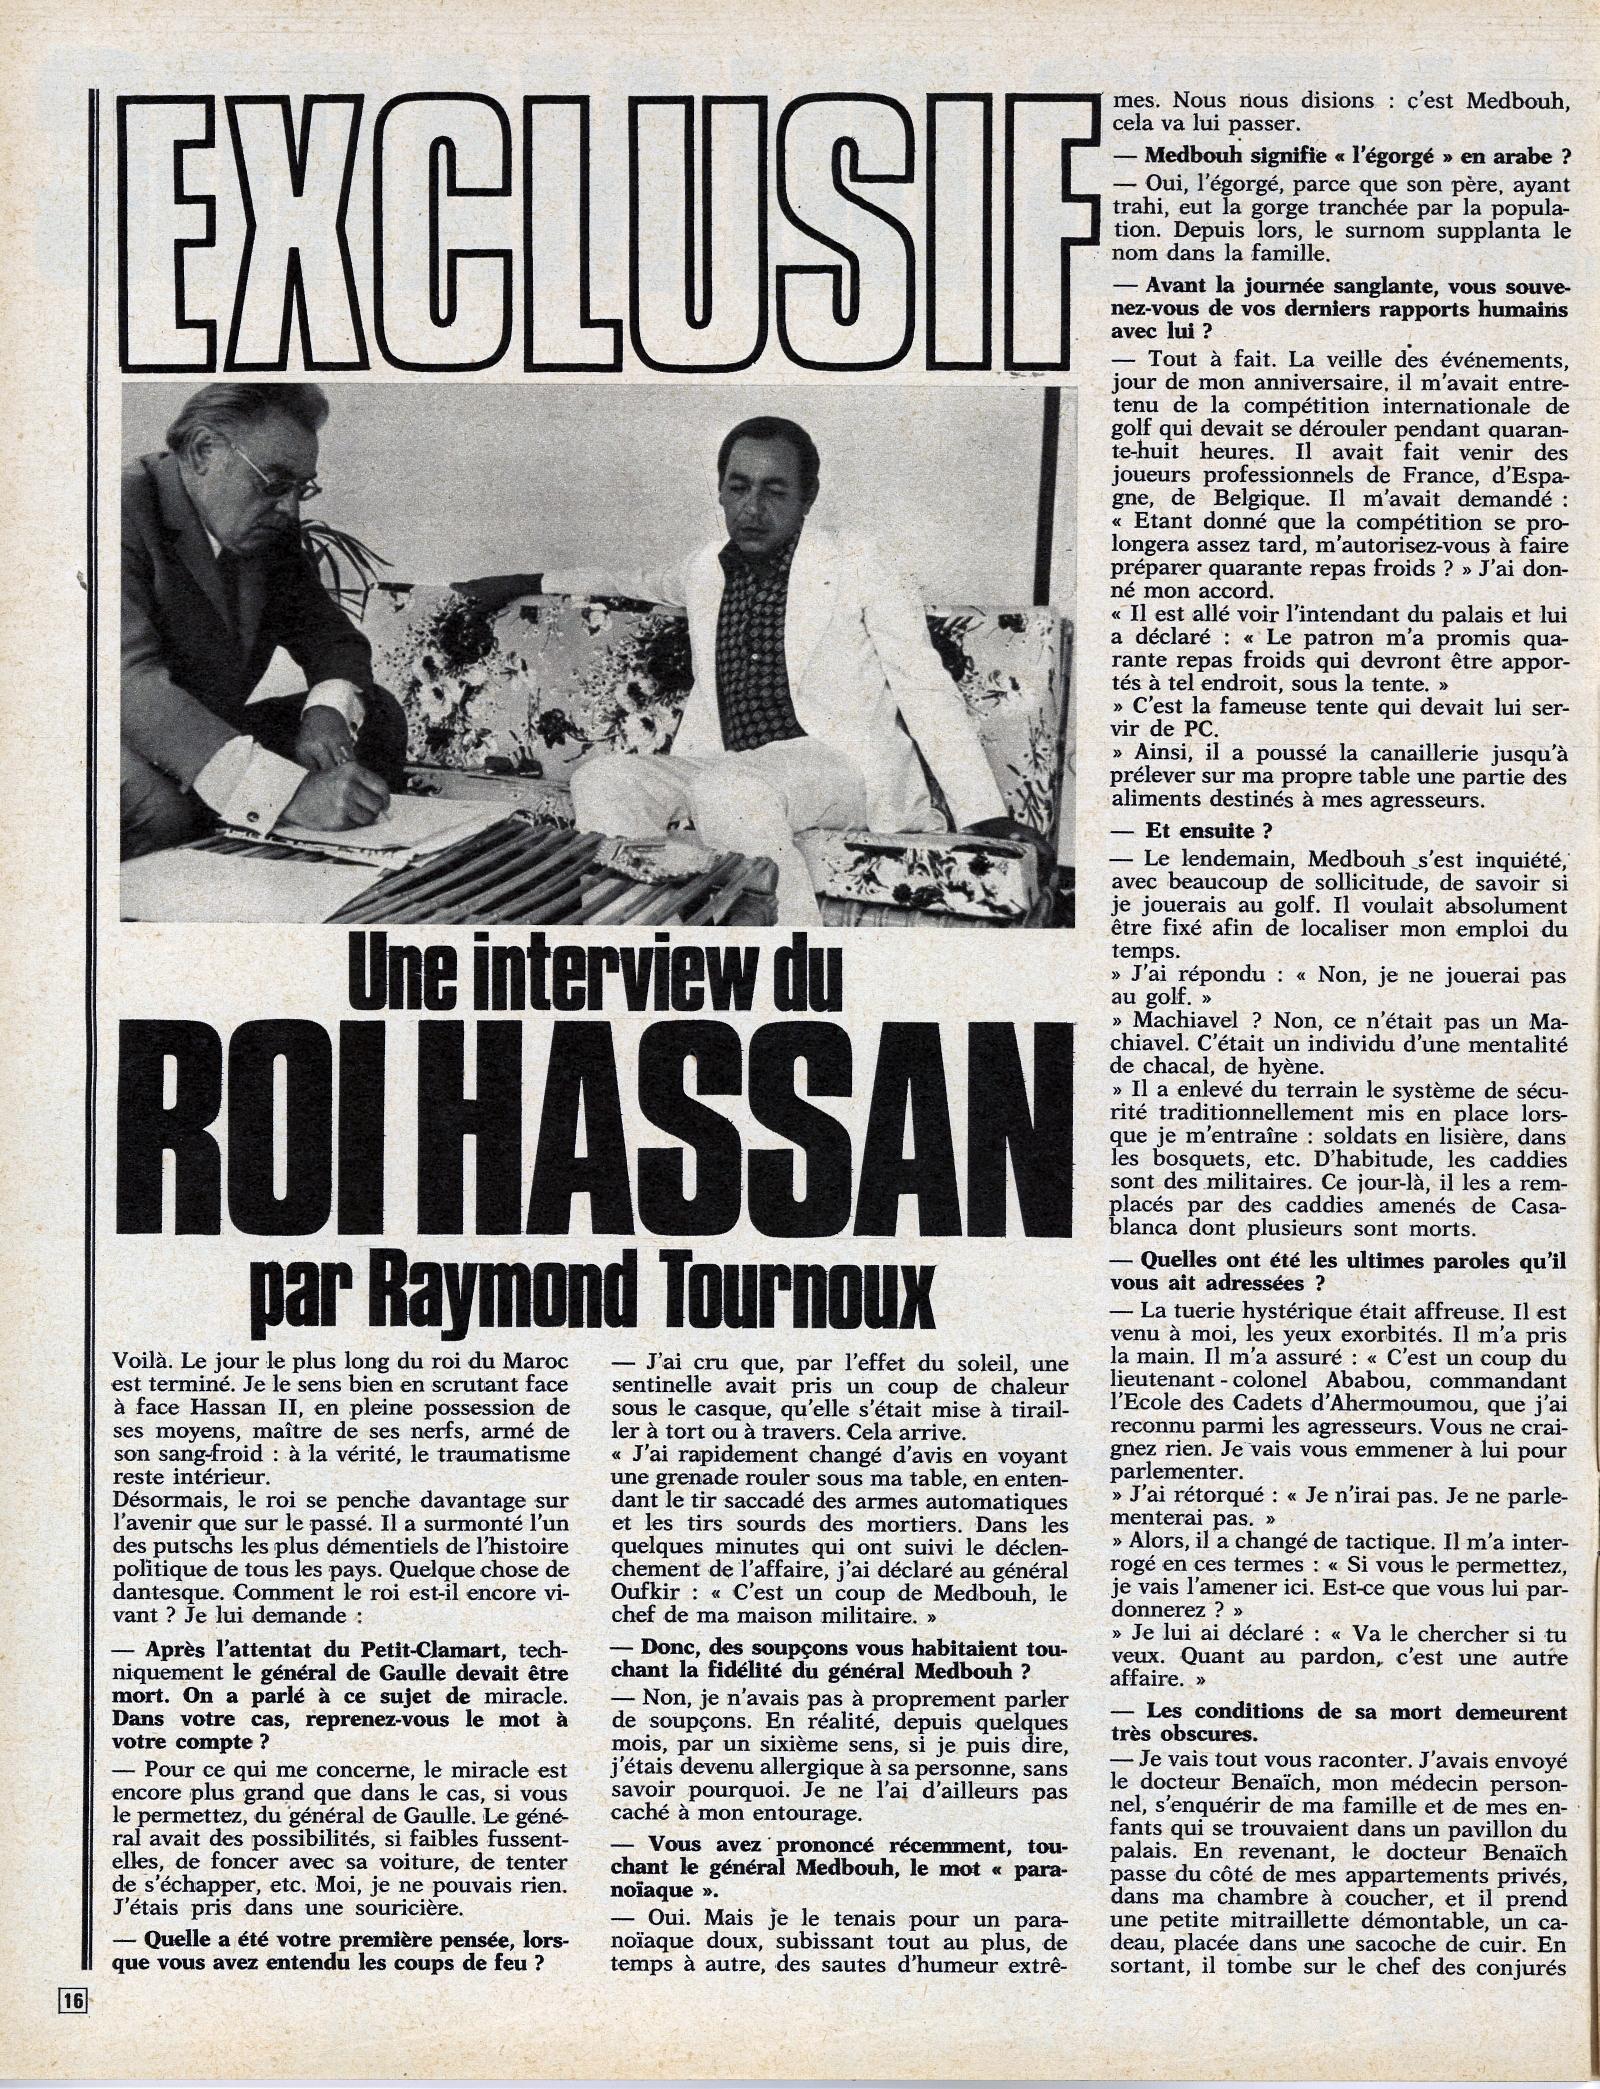 Tentative de coup d'État à Rabat et Skhirate le 10 juillet 1971  48695821572_ebde2e4cbe_o